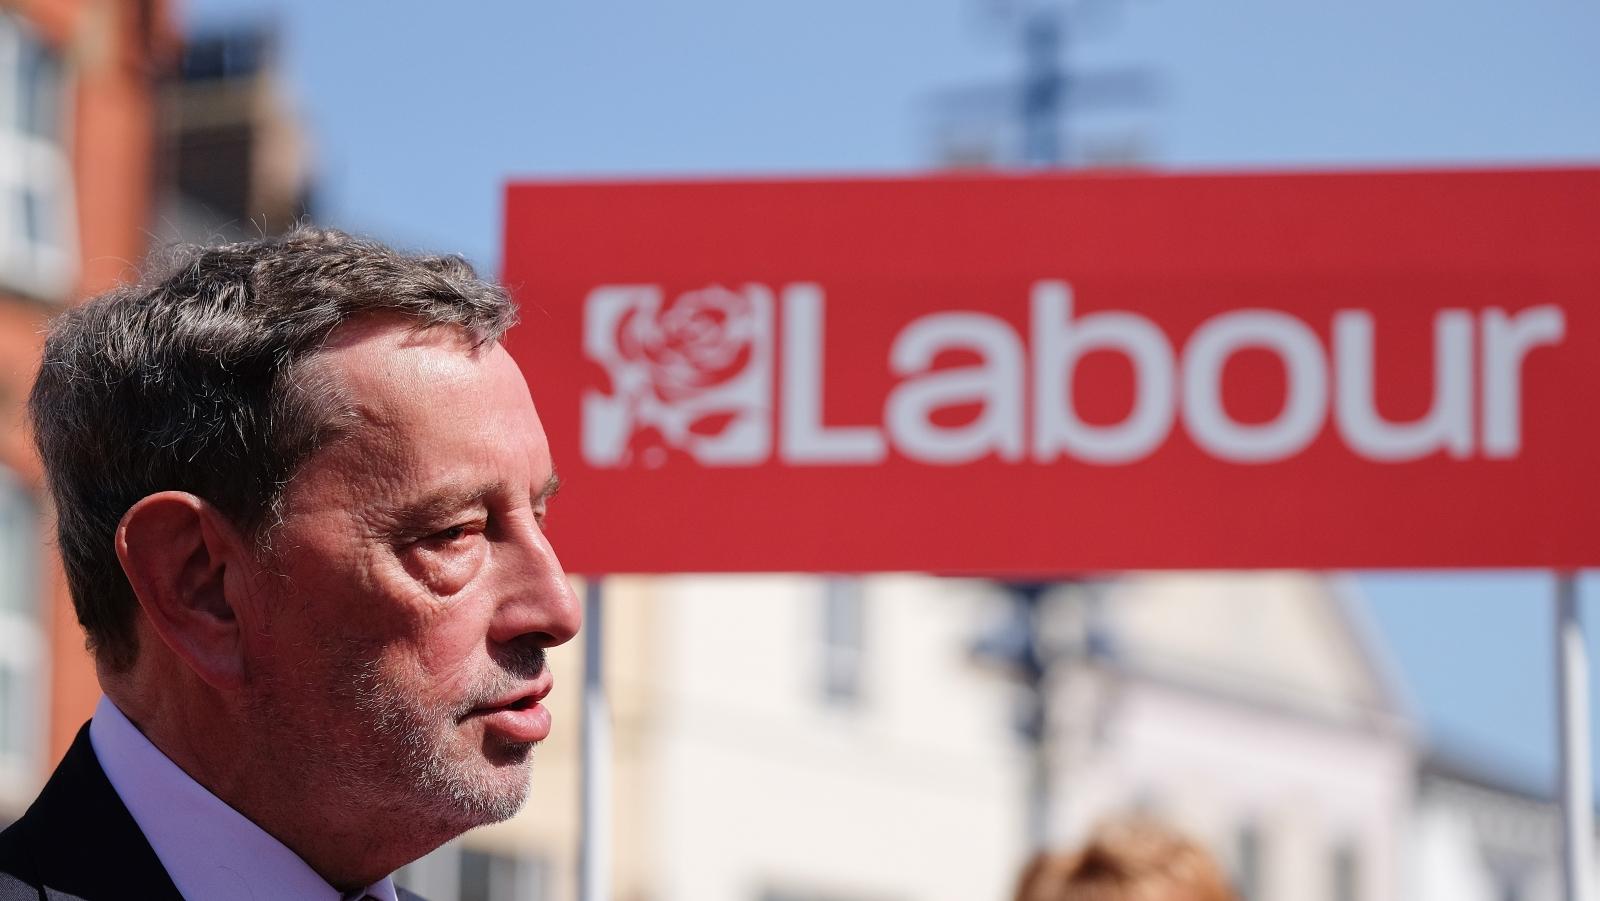 David Blunkett on Jeremy Corbyn